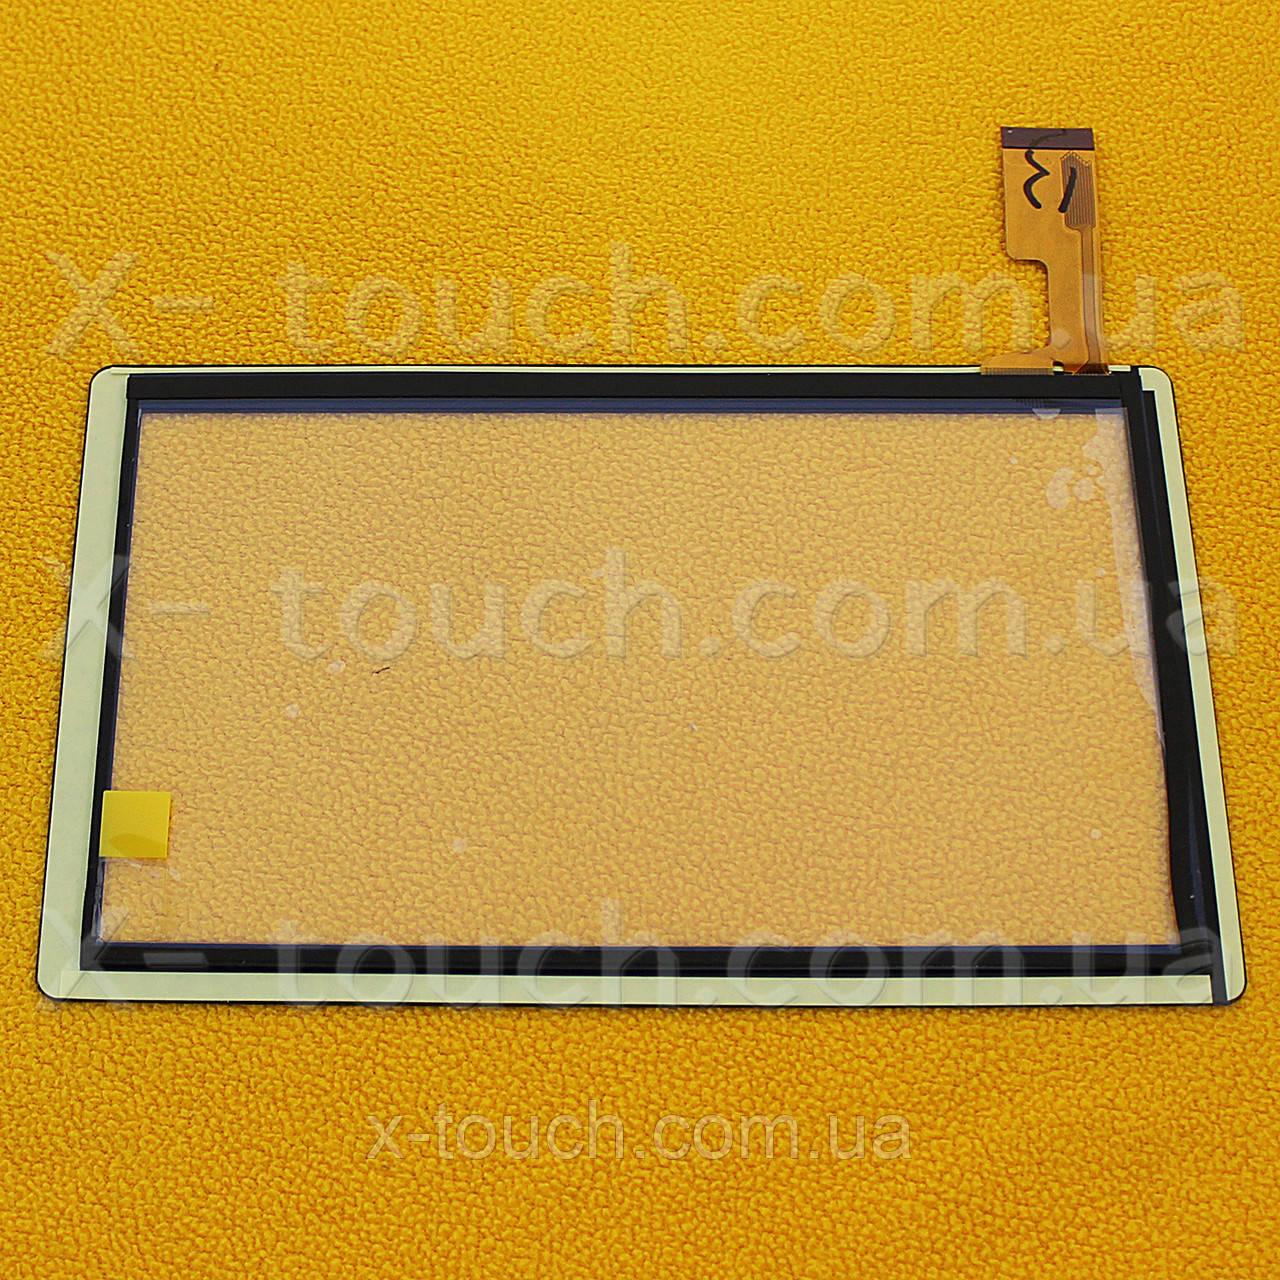 Тачскрин, сенсор  Ls-fpc0700mg76 , hk70dr2010  для планшета